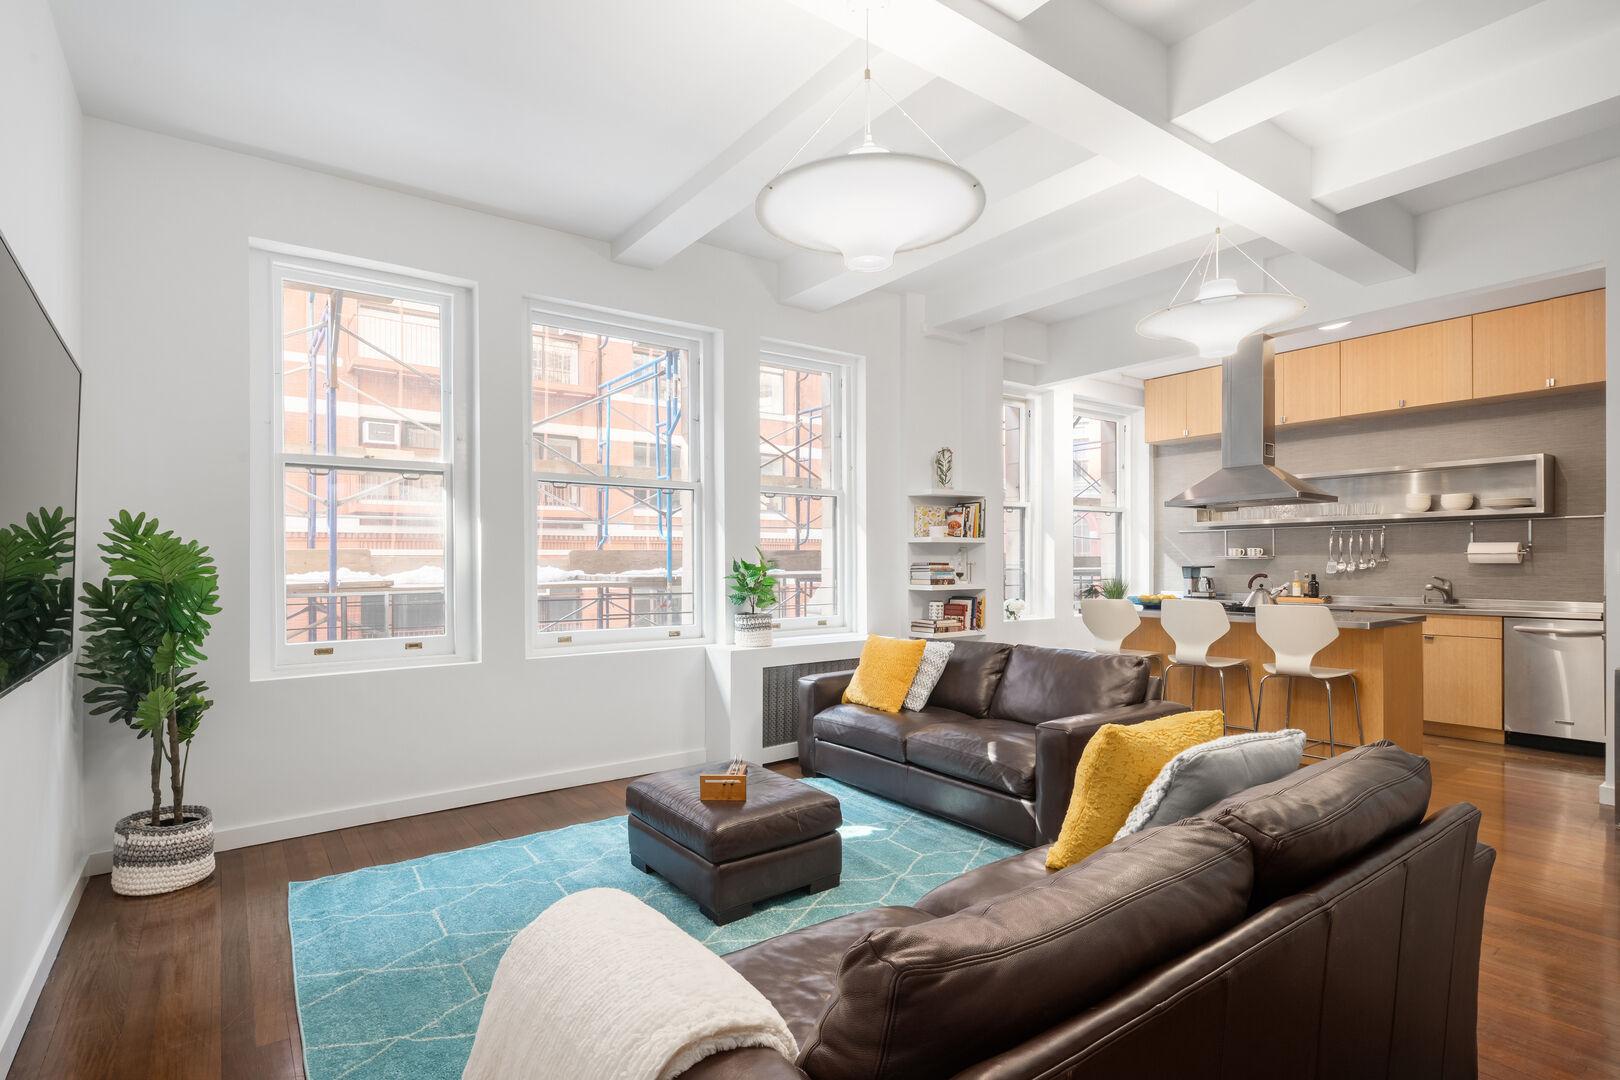 Apartment for sale at 100 Hudson Street, Apt 3-B